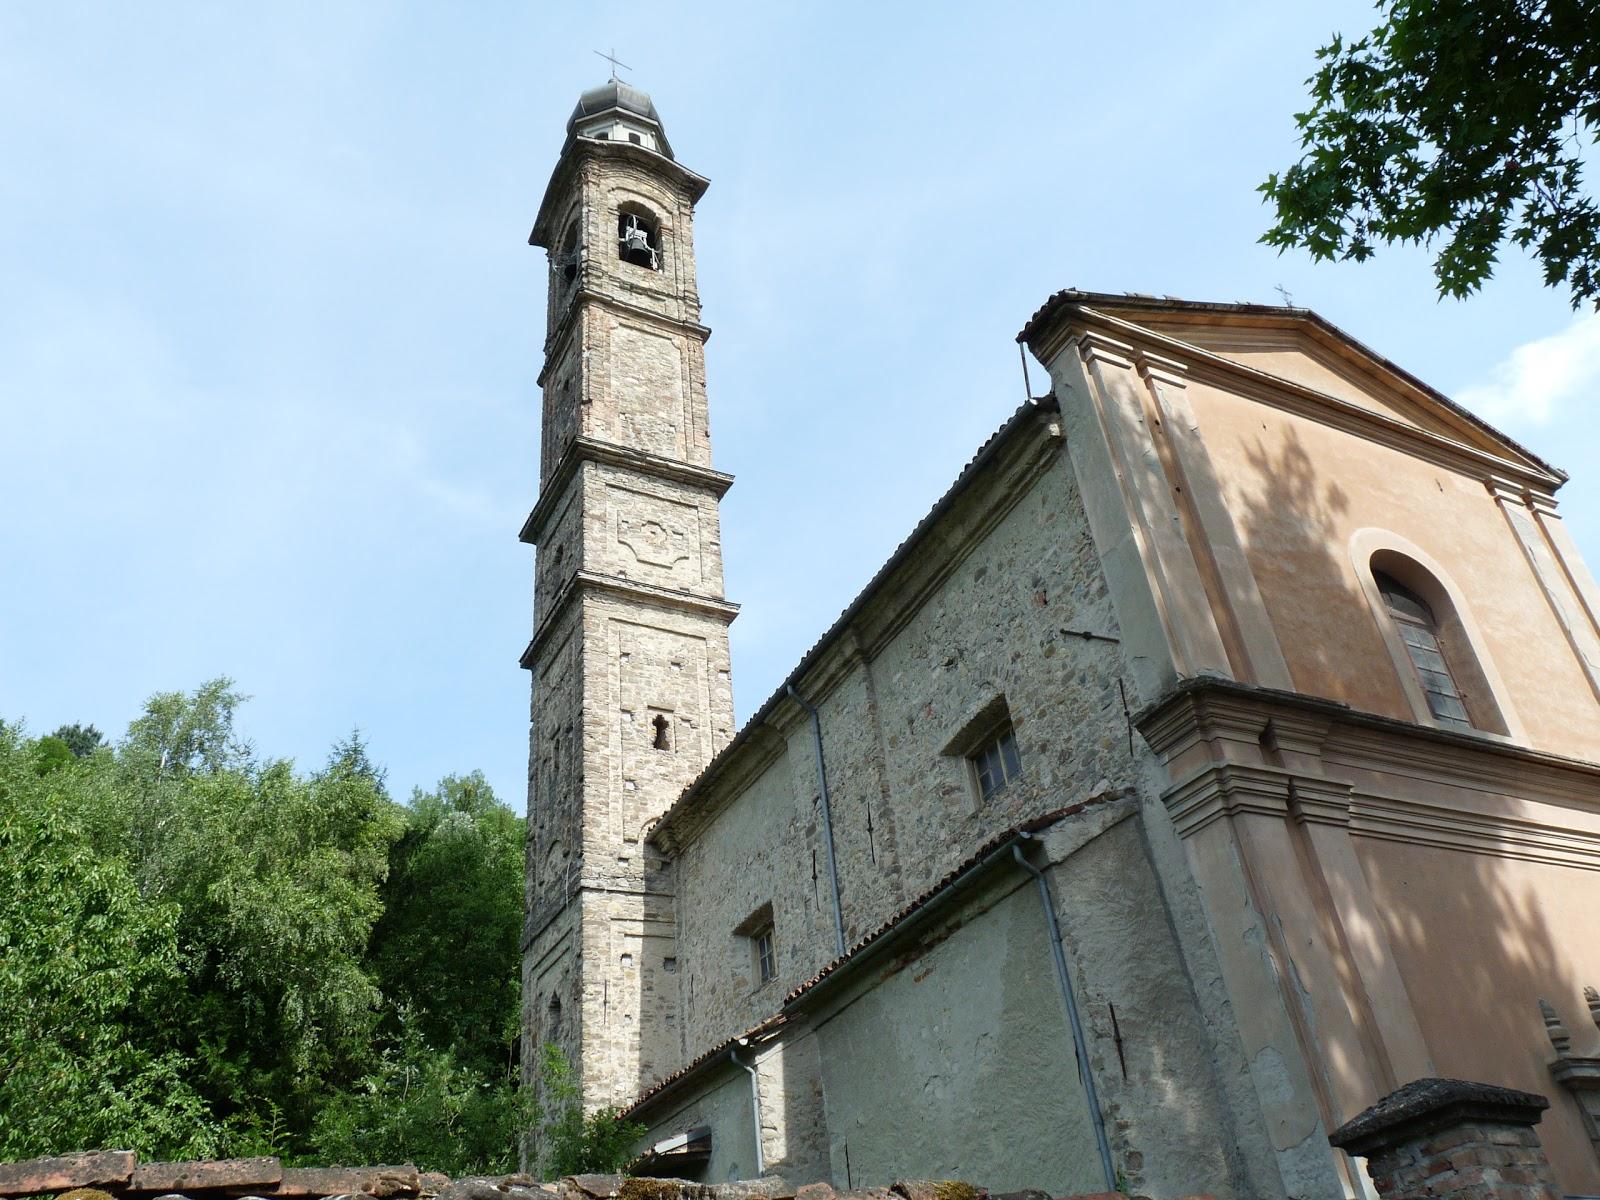 San Sebastiano Curone